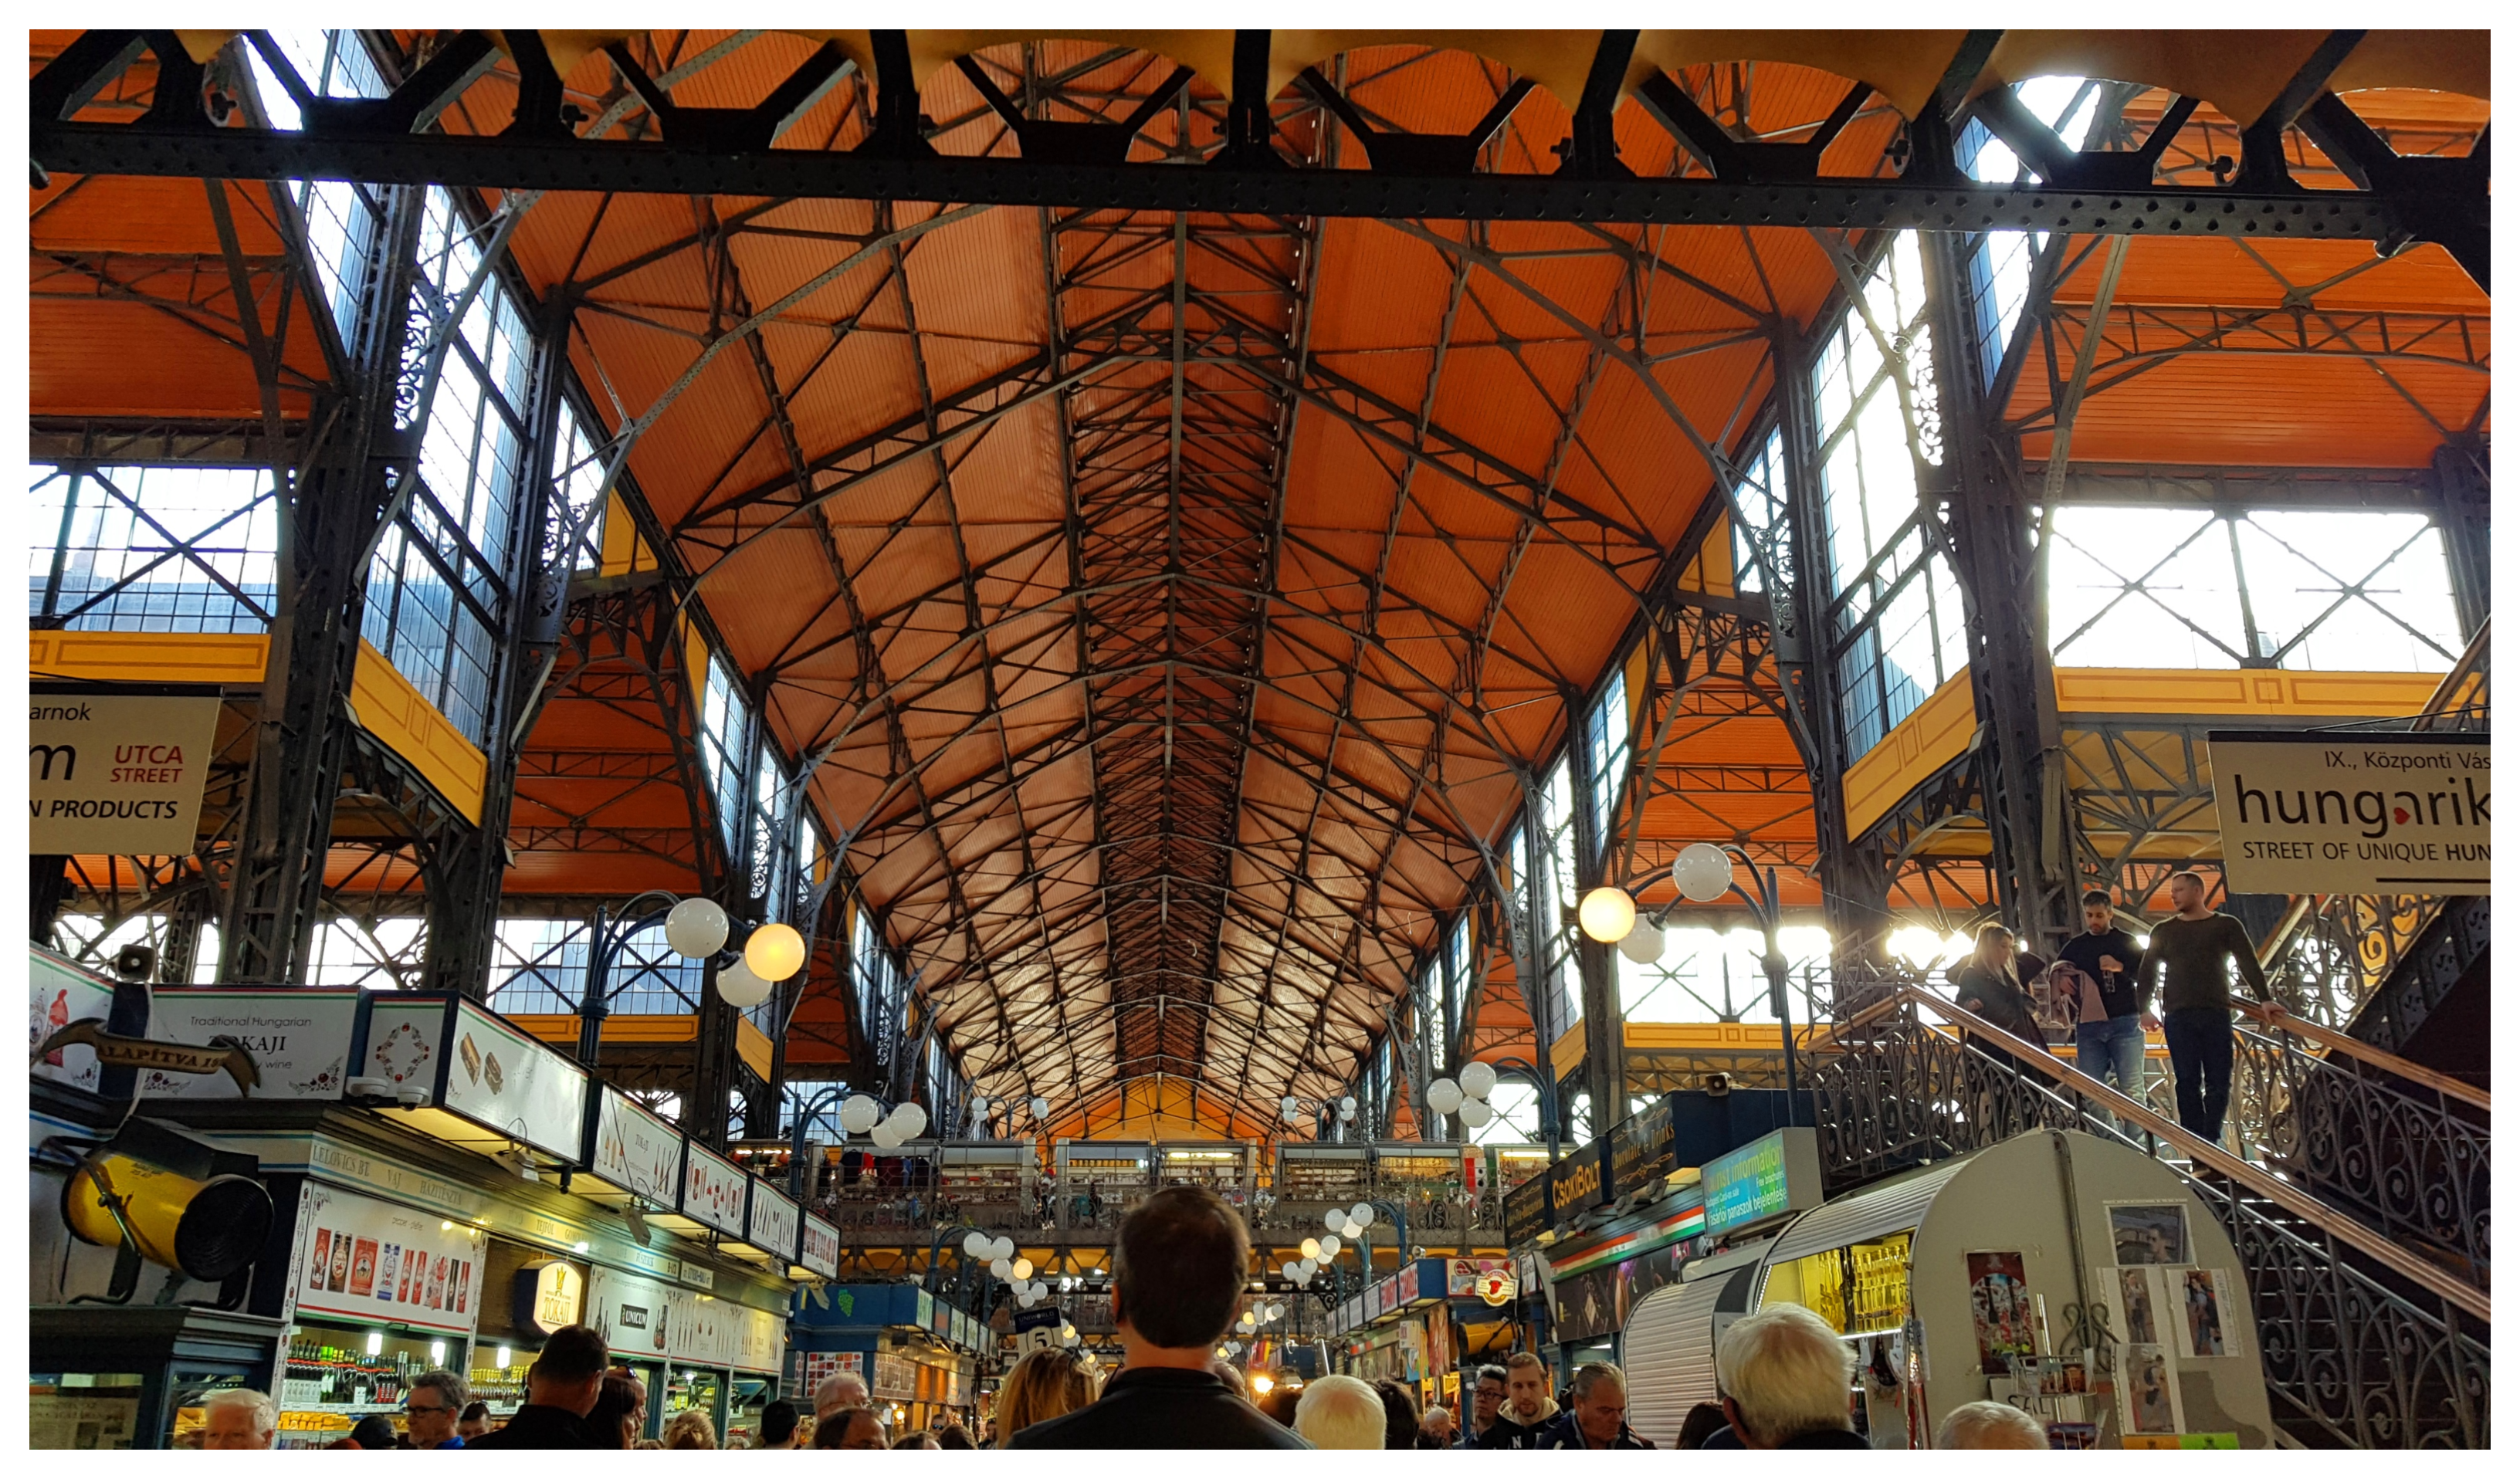 budapest-marché-couvert